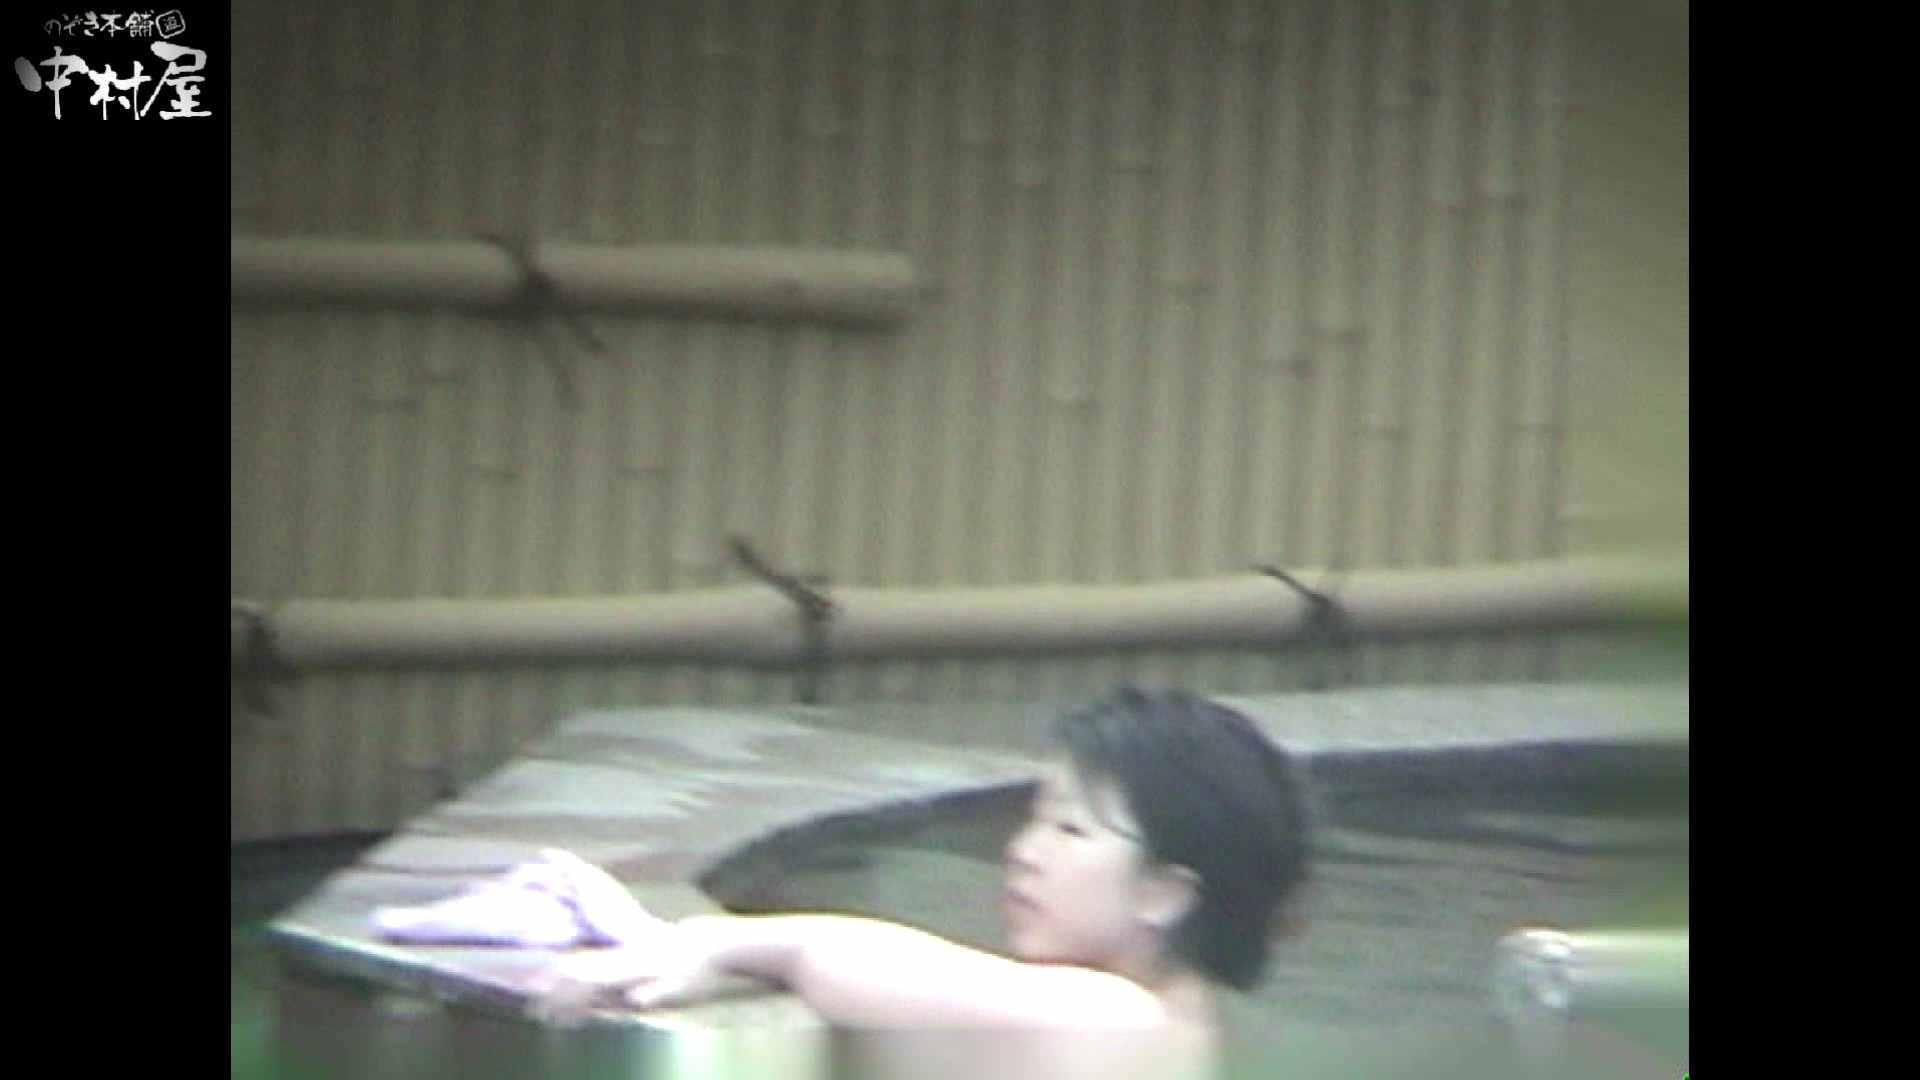 Aquaな露天風呂Vol.936 盗撮映像  110Pix 9